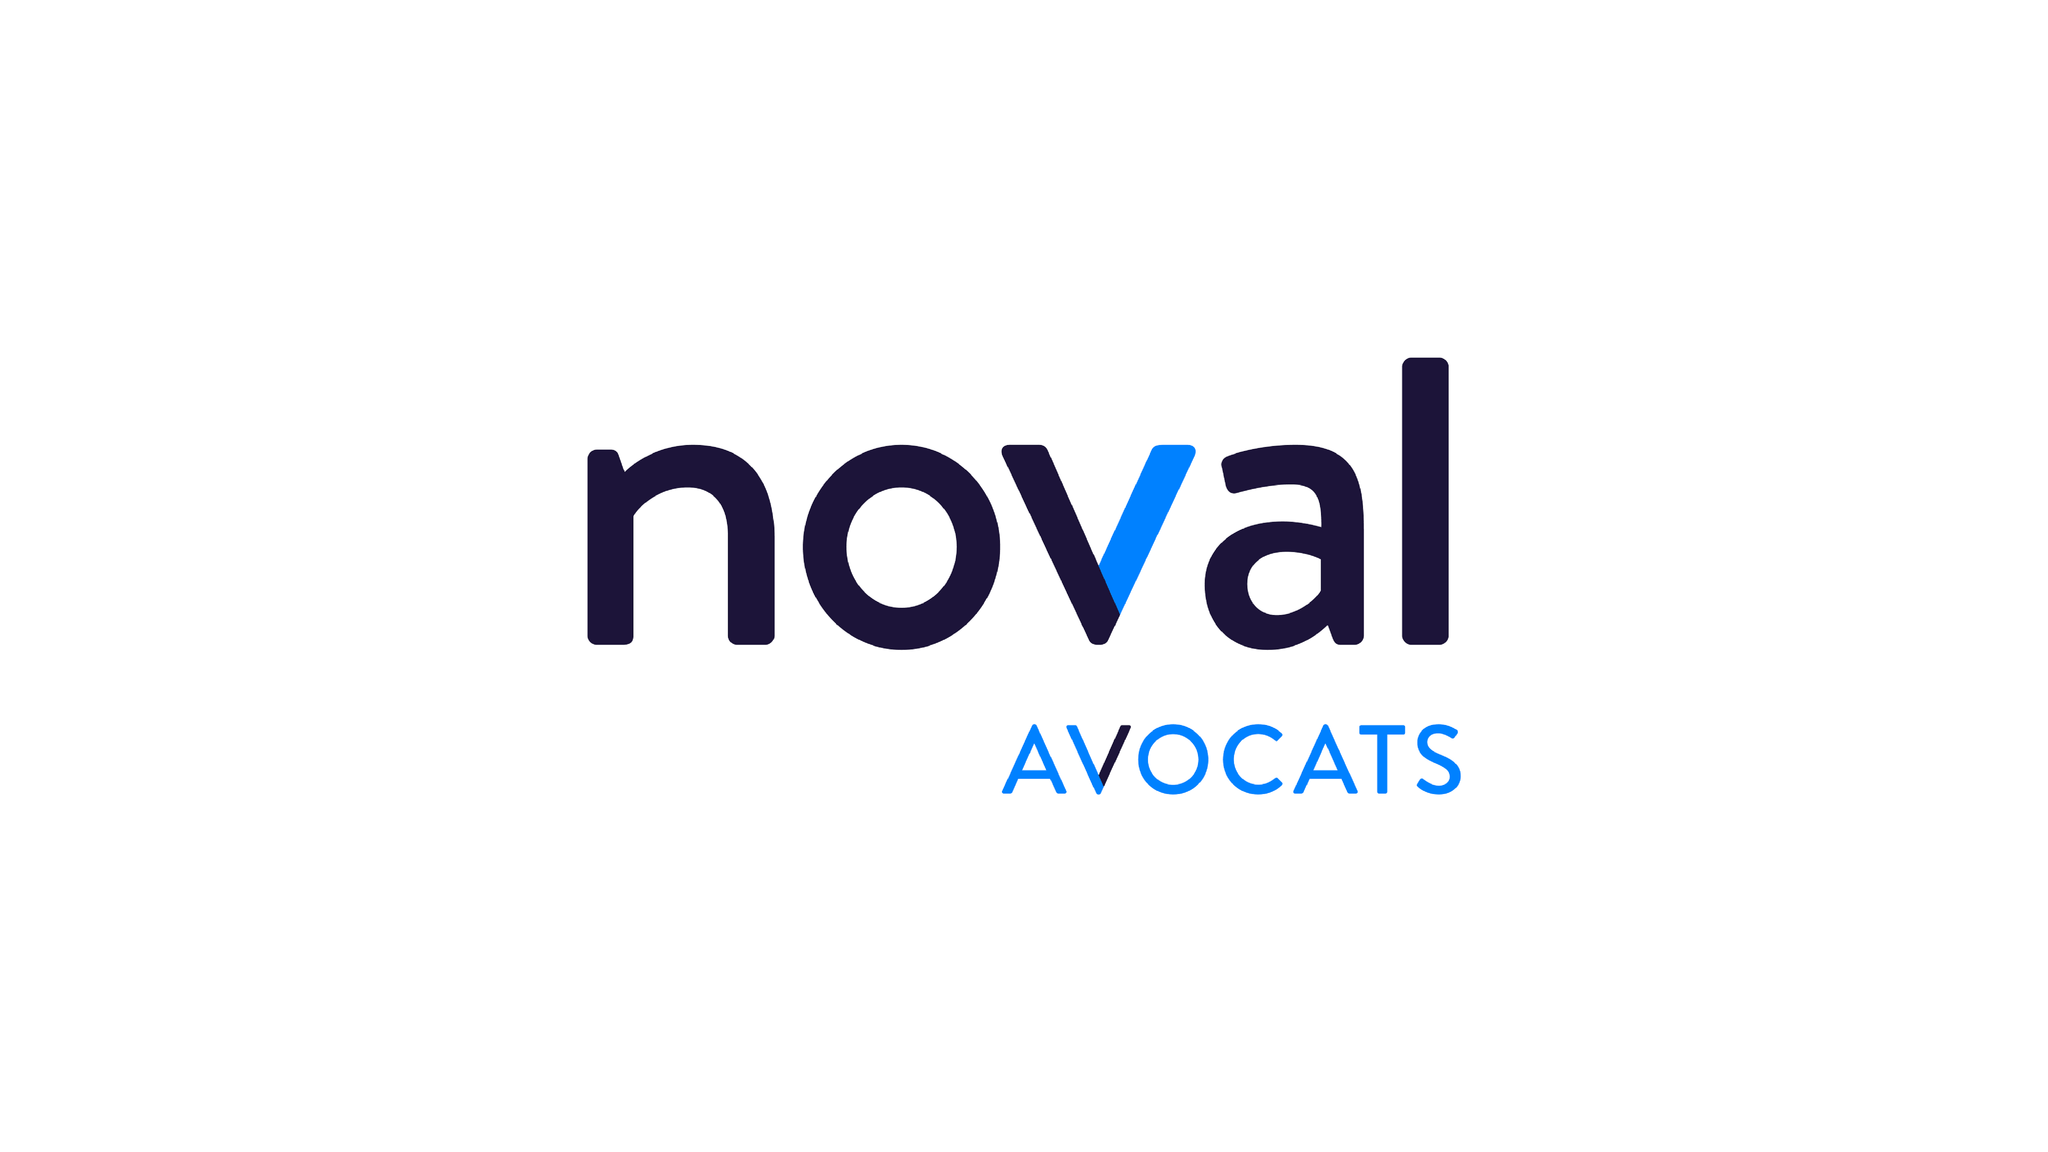 Noval Avocats